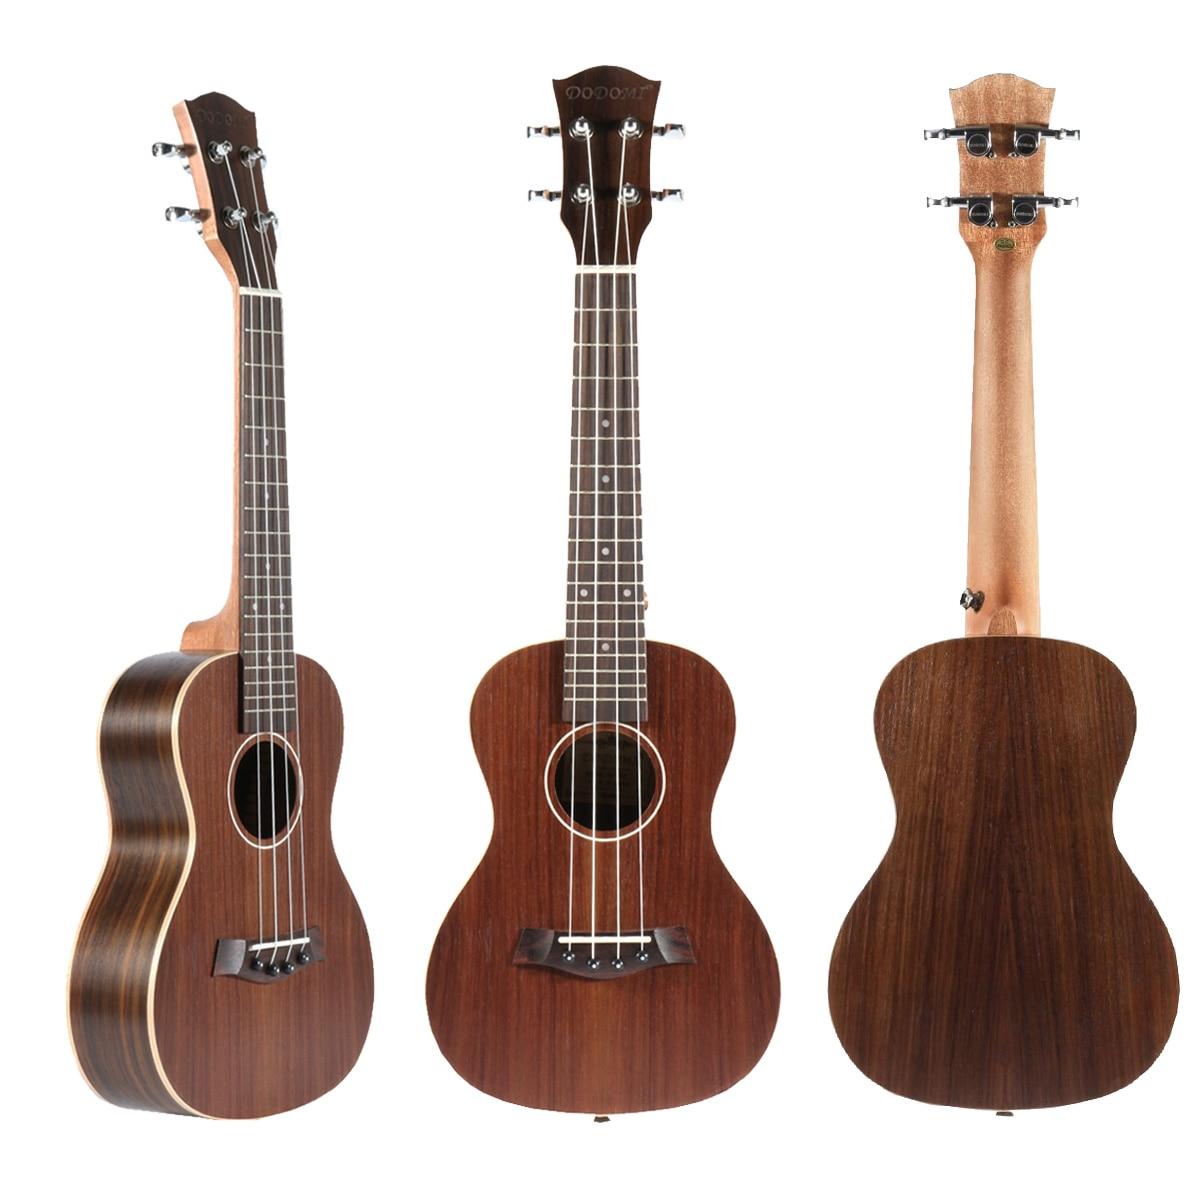 Rosewood 23 Inch 4 Strings Fretboard Concert Ukulele Electric Guitar Guitarra For Musical Stringed Instruments Lovers